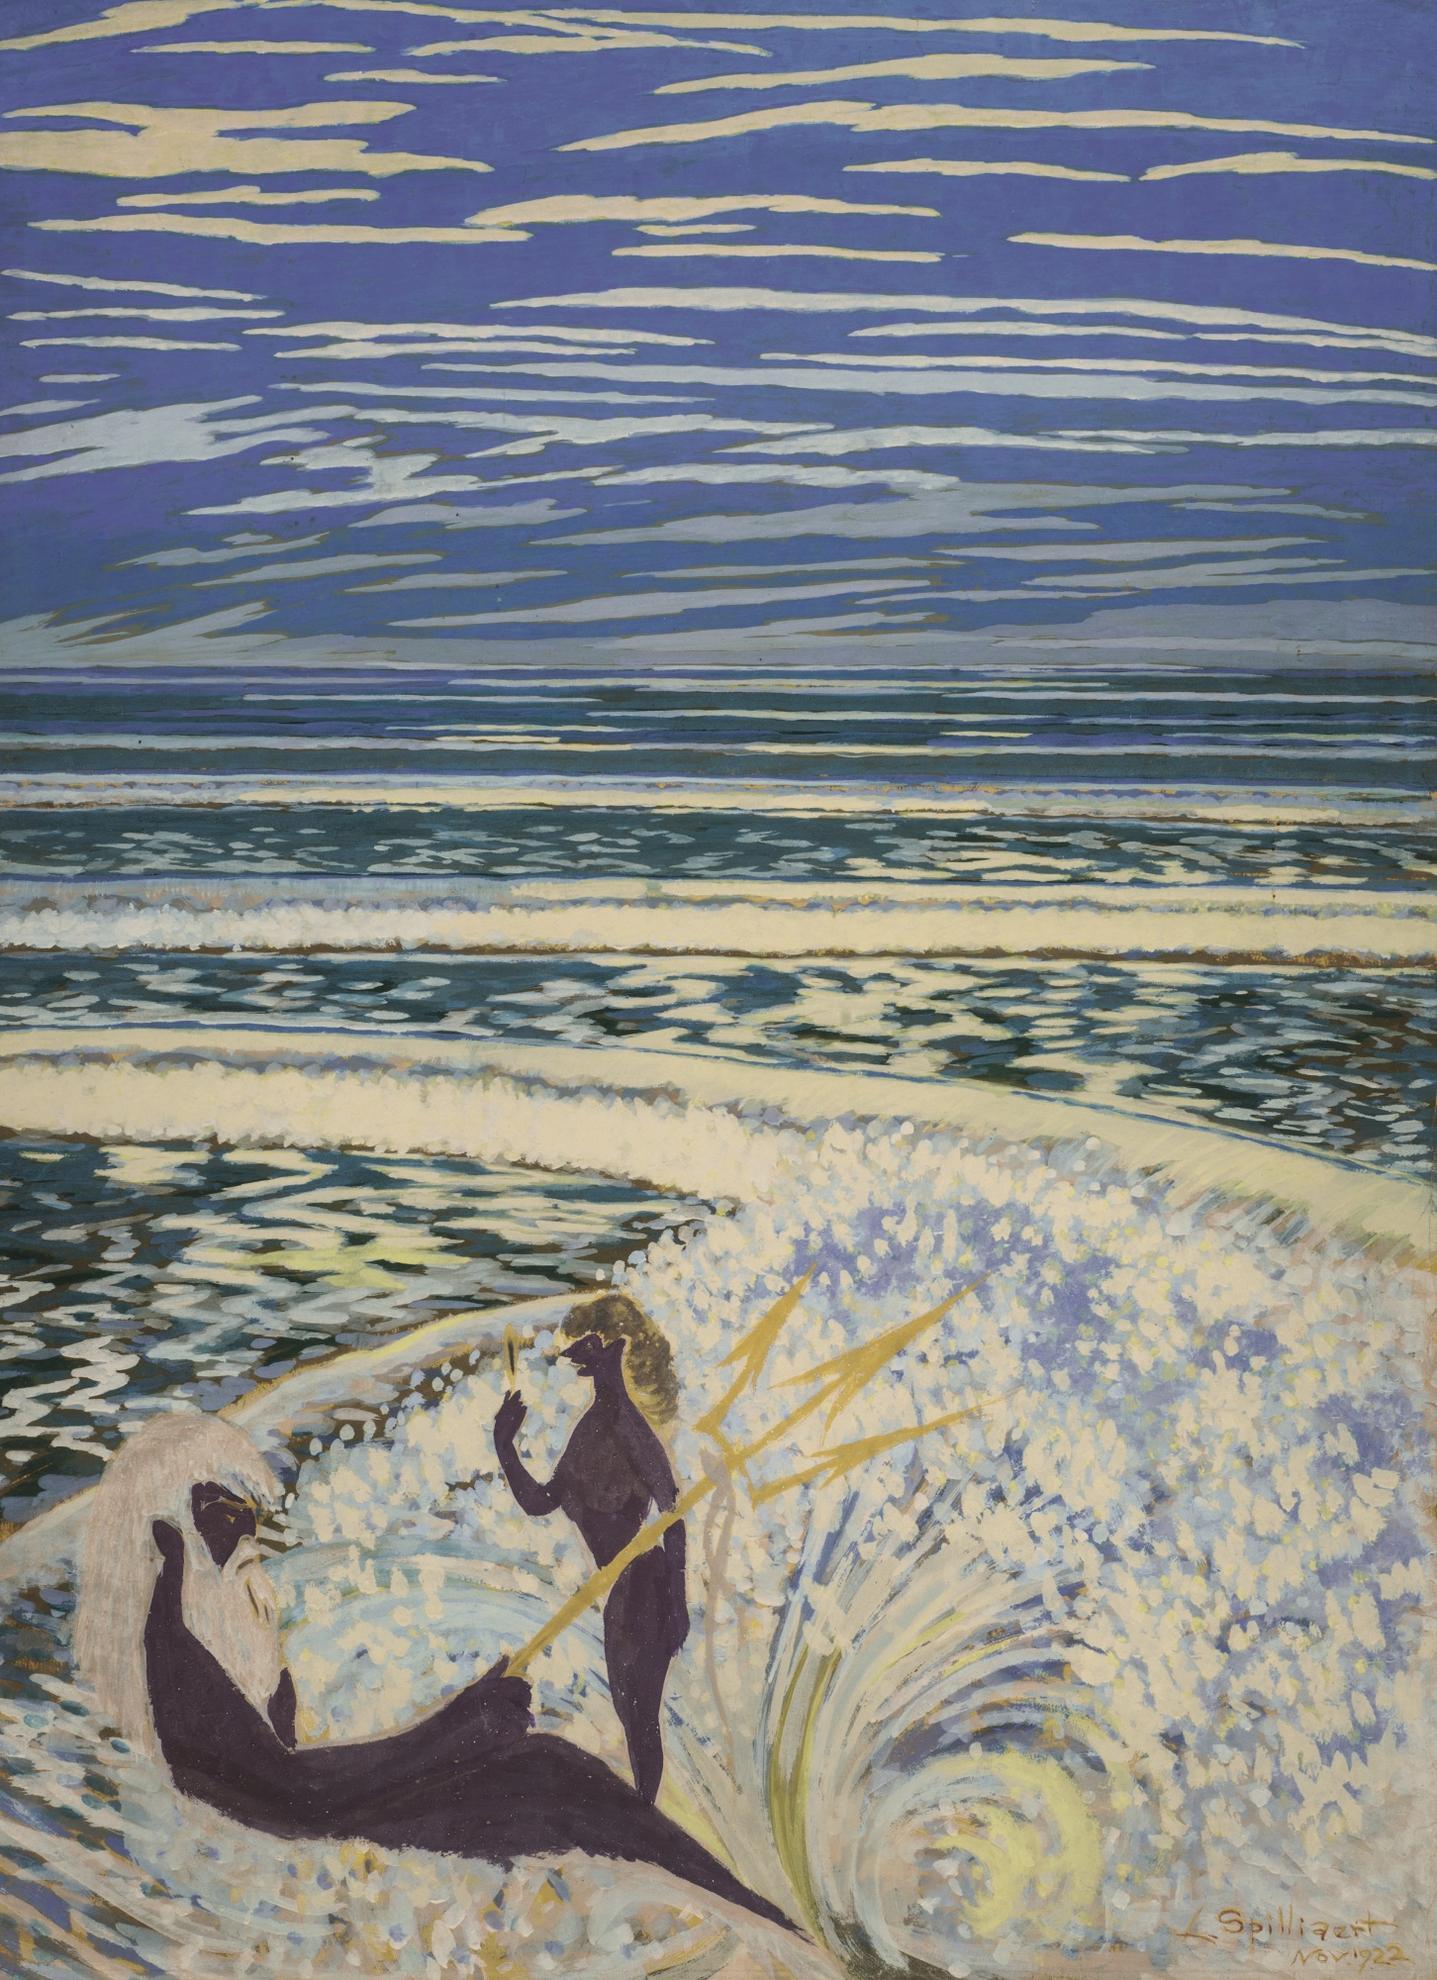 Leon Spilliaert-Neptune Et Galathee-1922